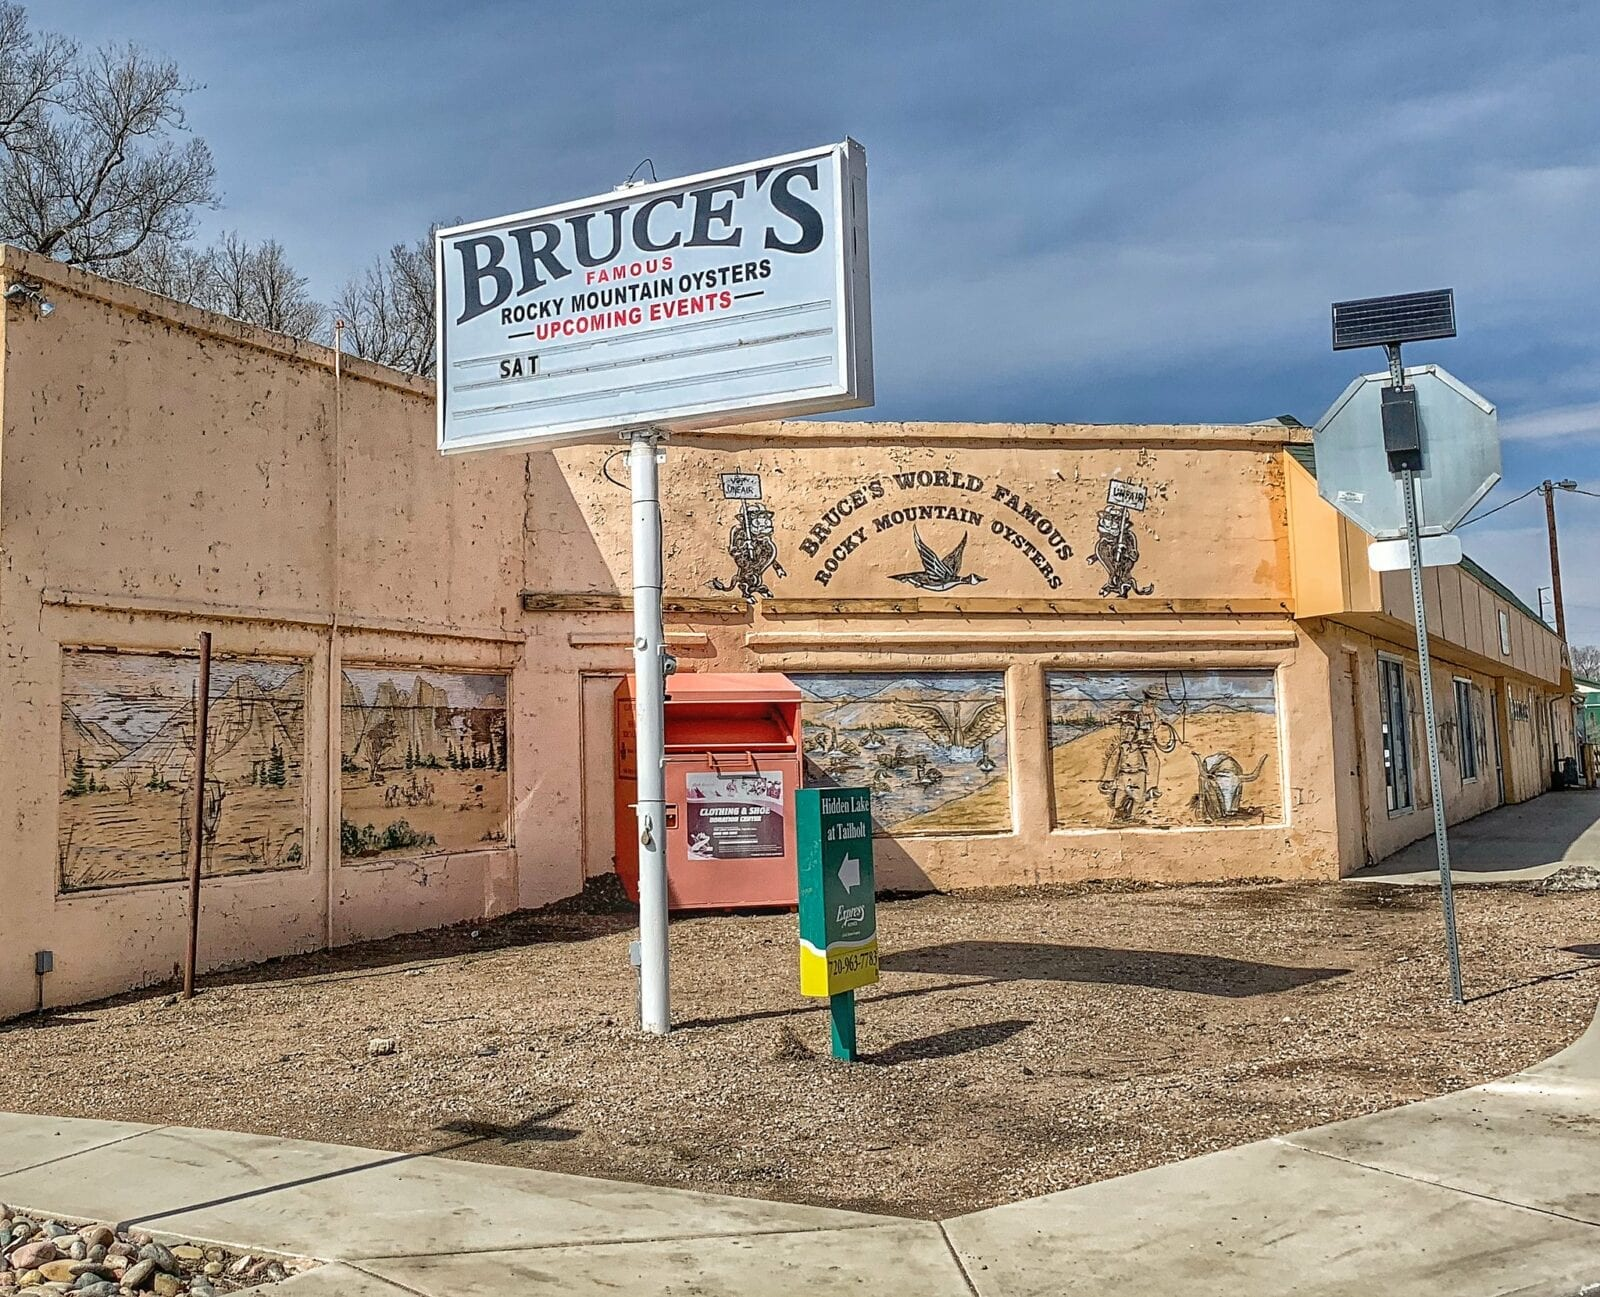 image of Bruce's bar